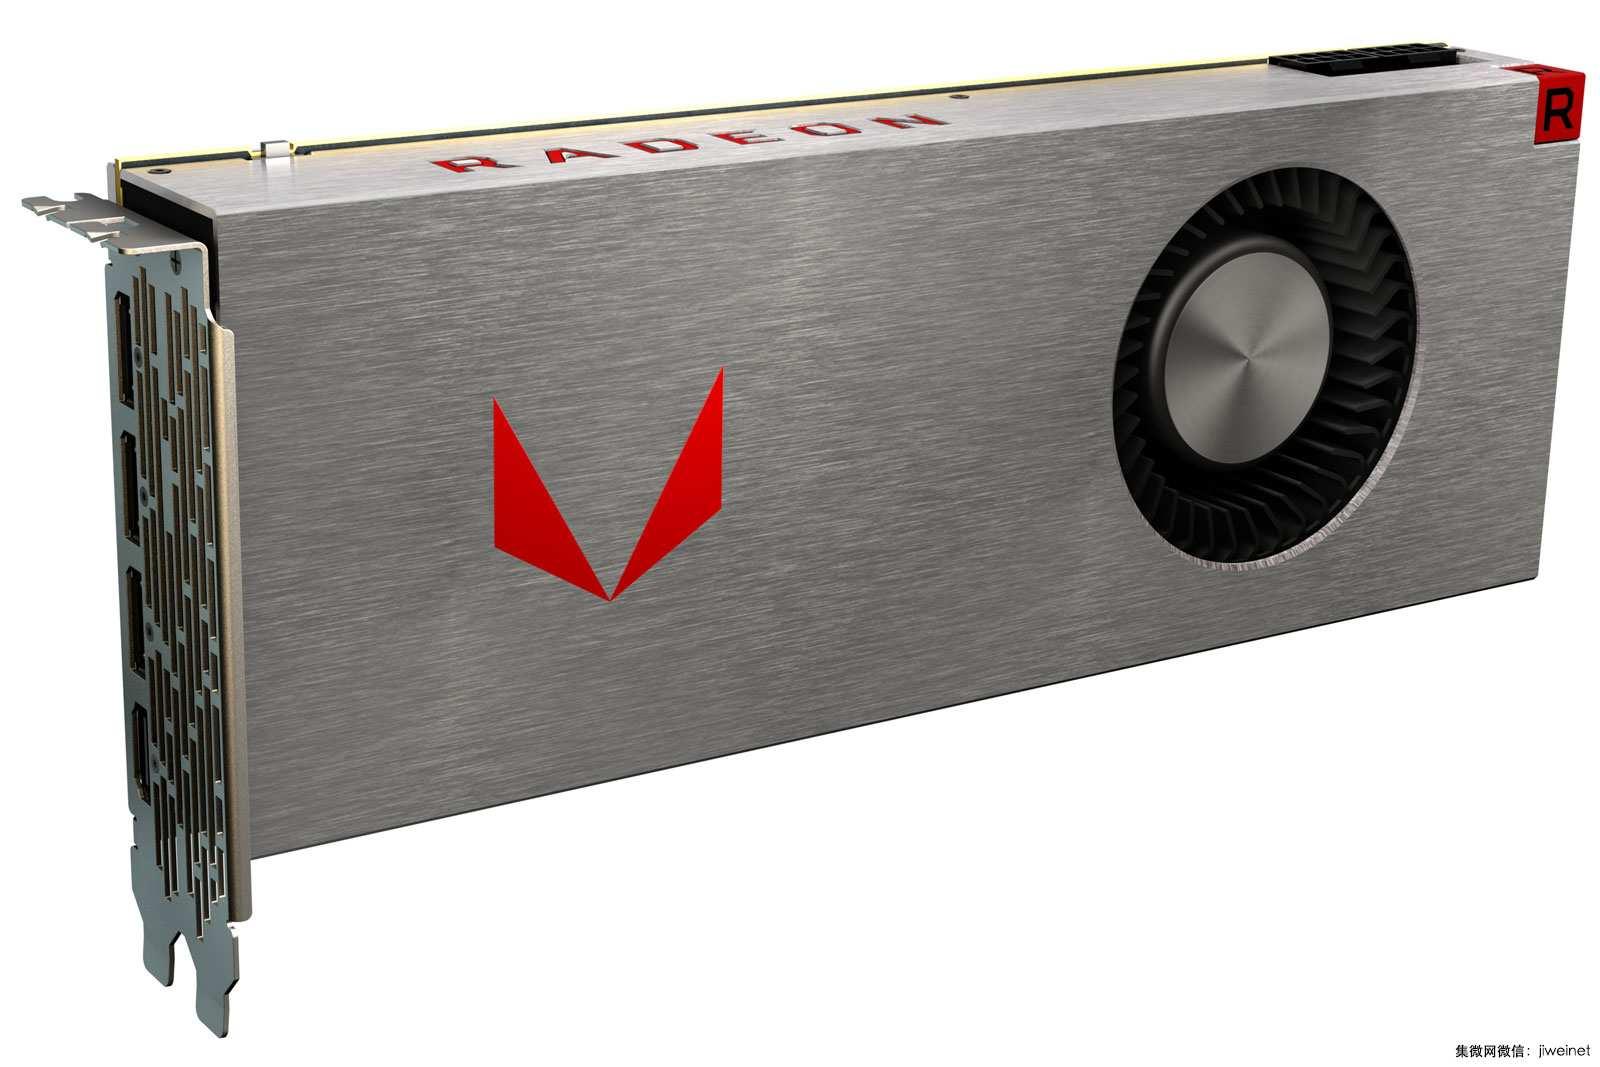 AMD 新显卡 Radeon RX Vega 终登场